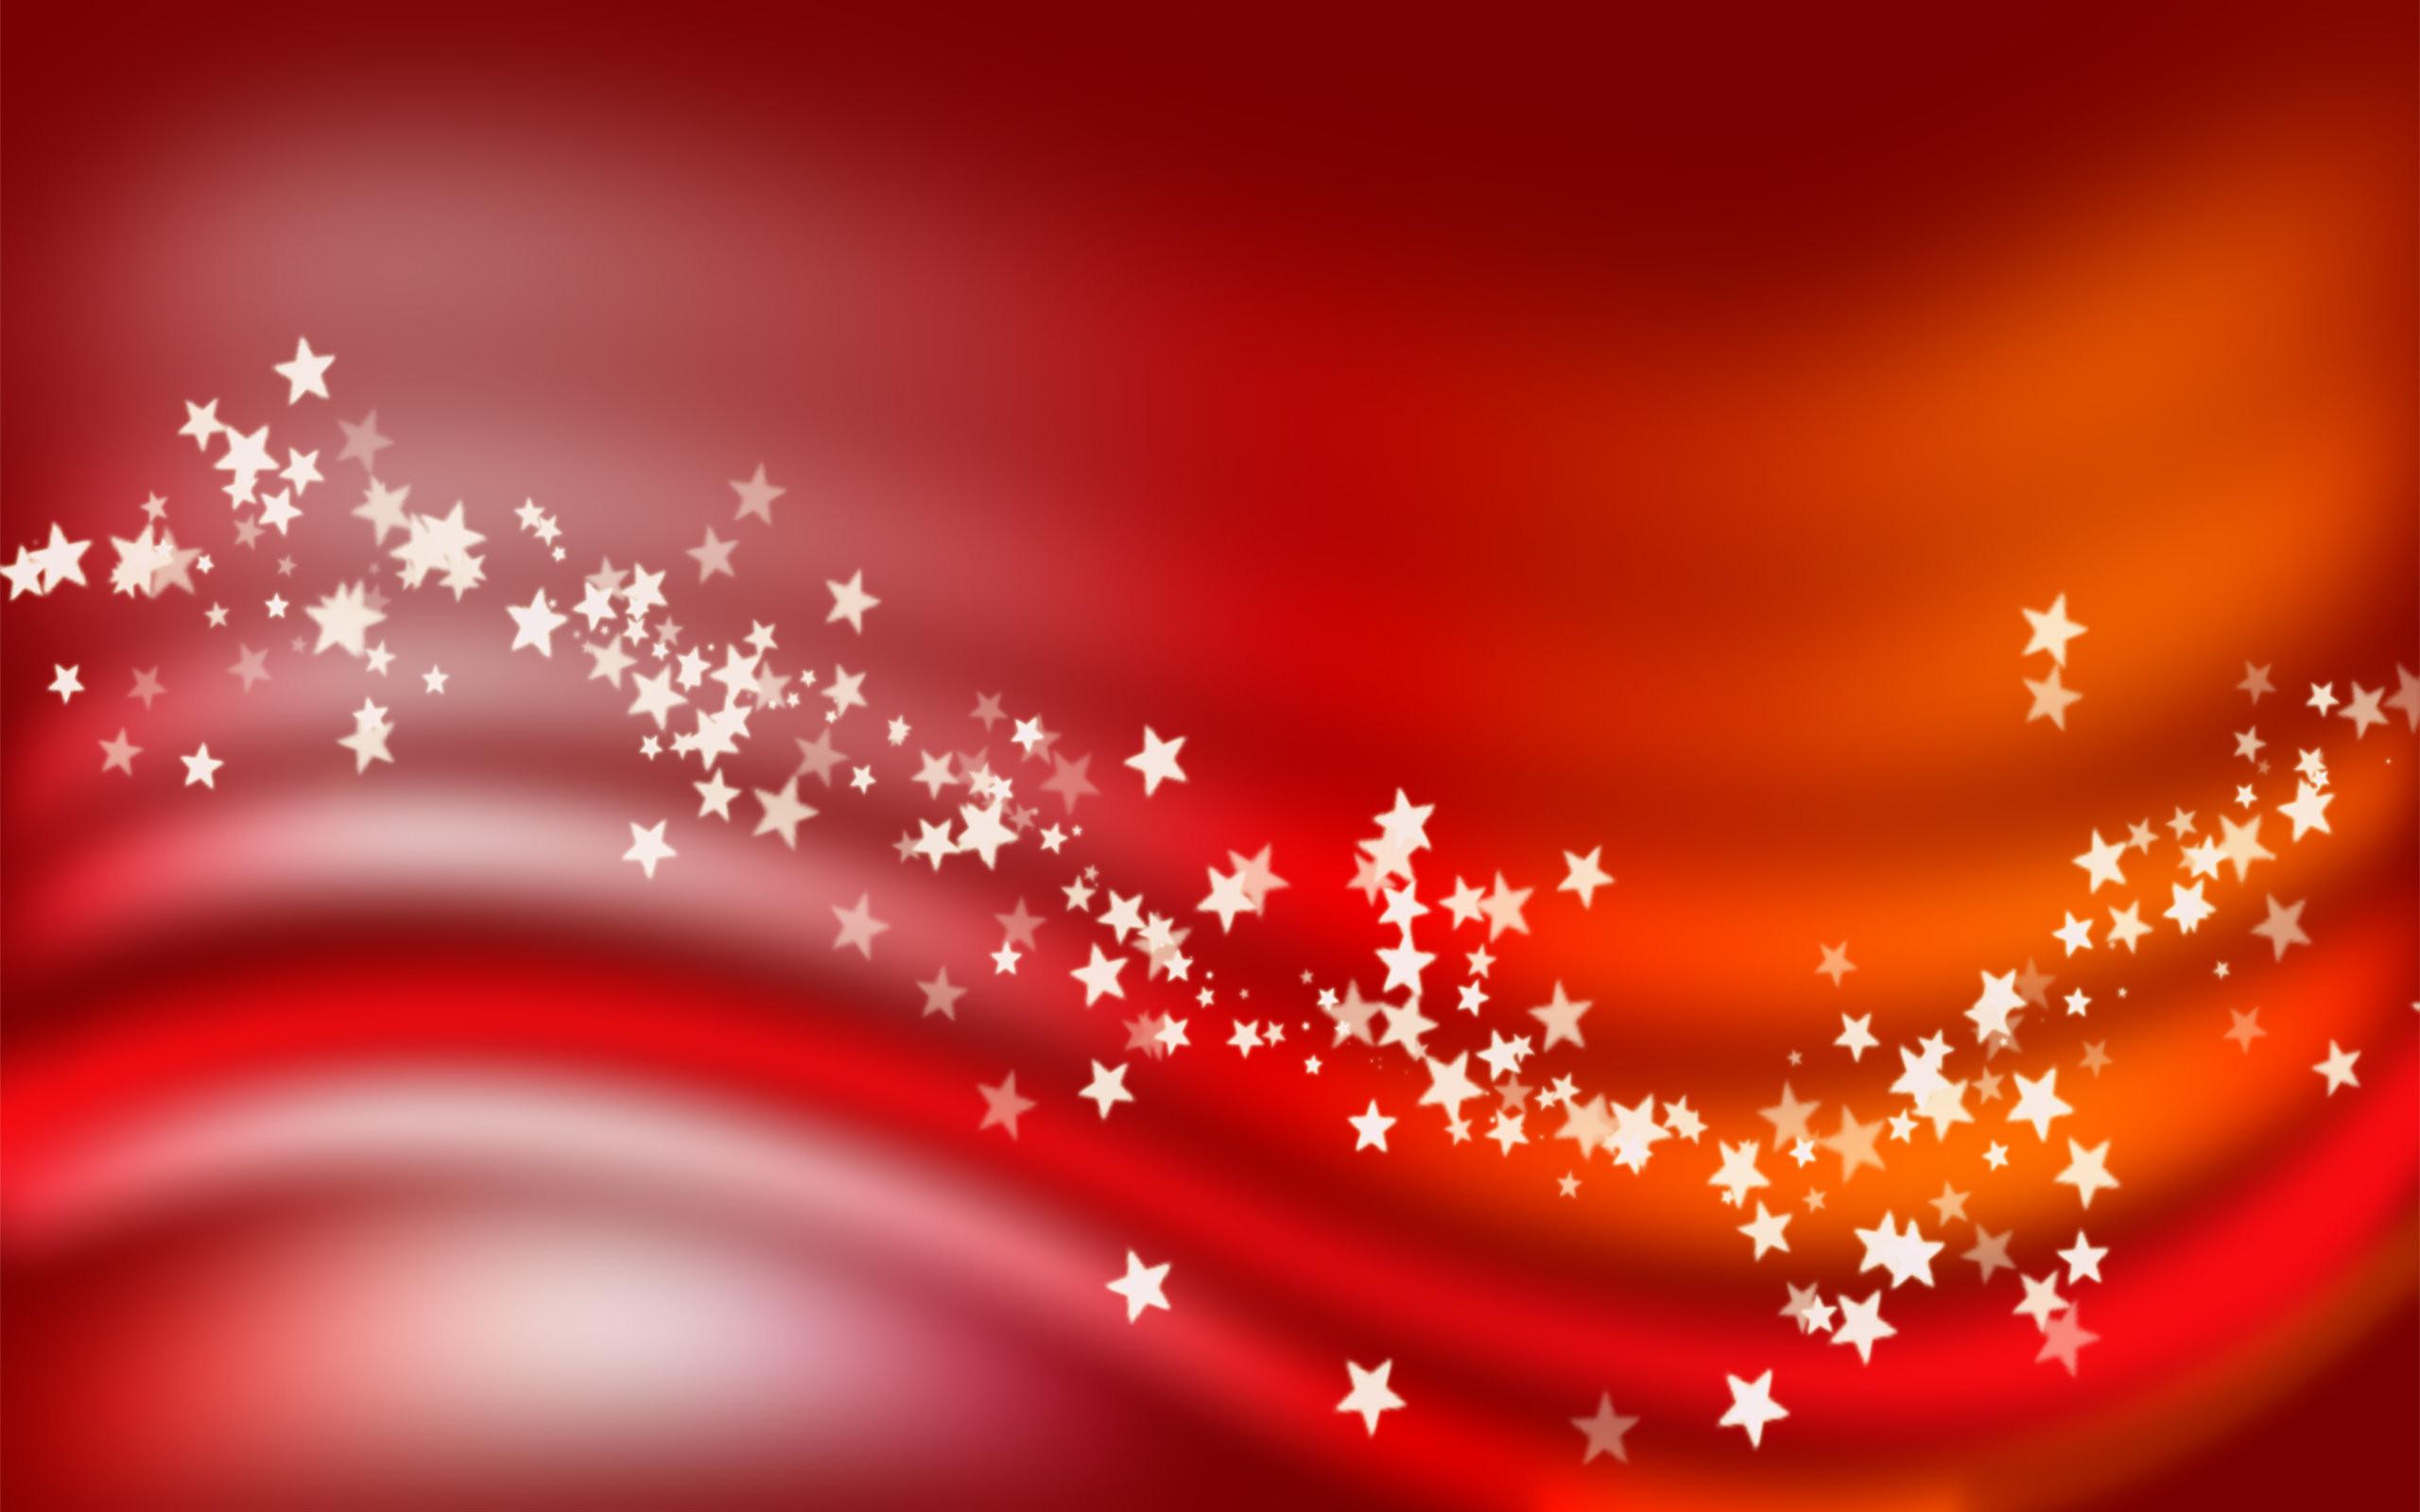 Red Xmas Wallpapers HD Wallpaper | Christmas Wallpapers